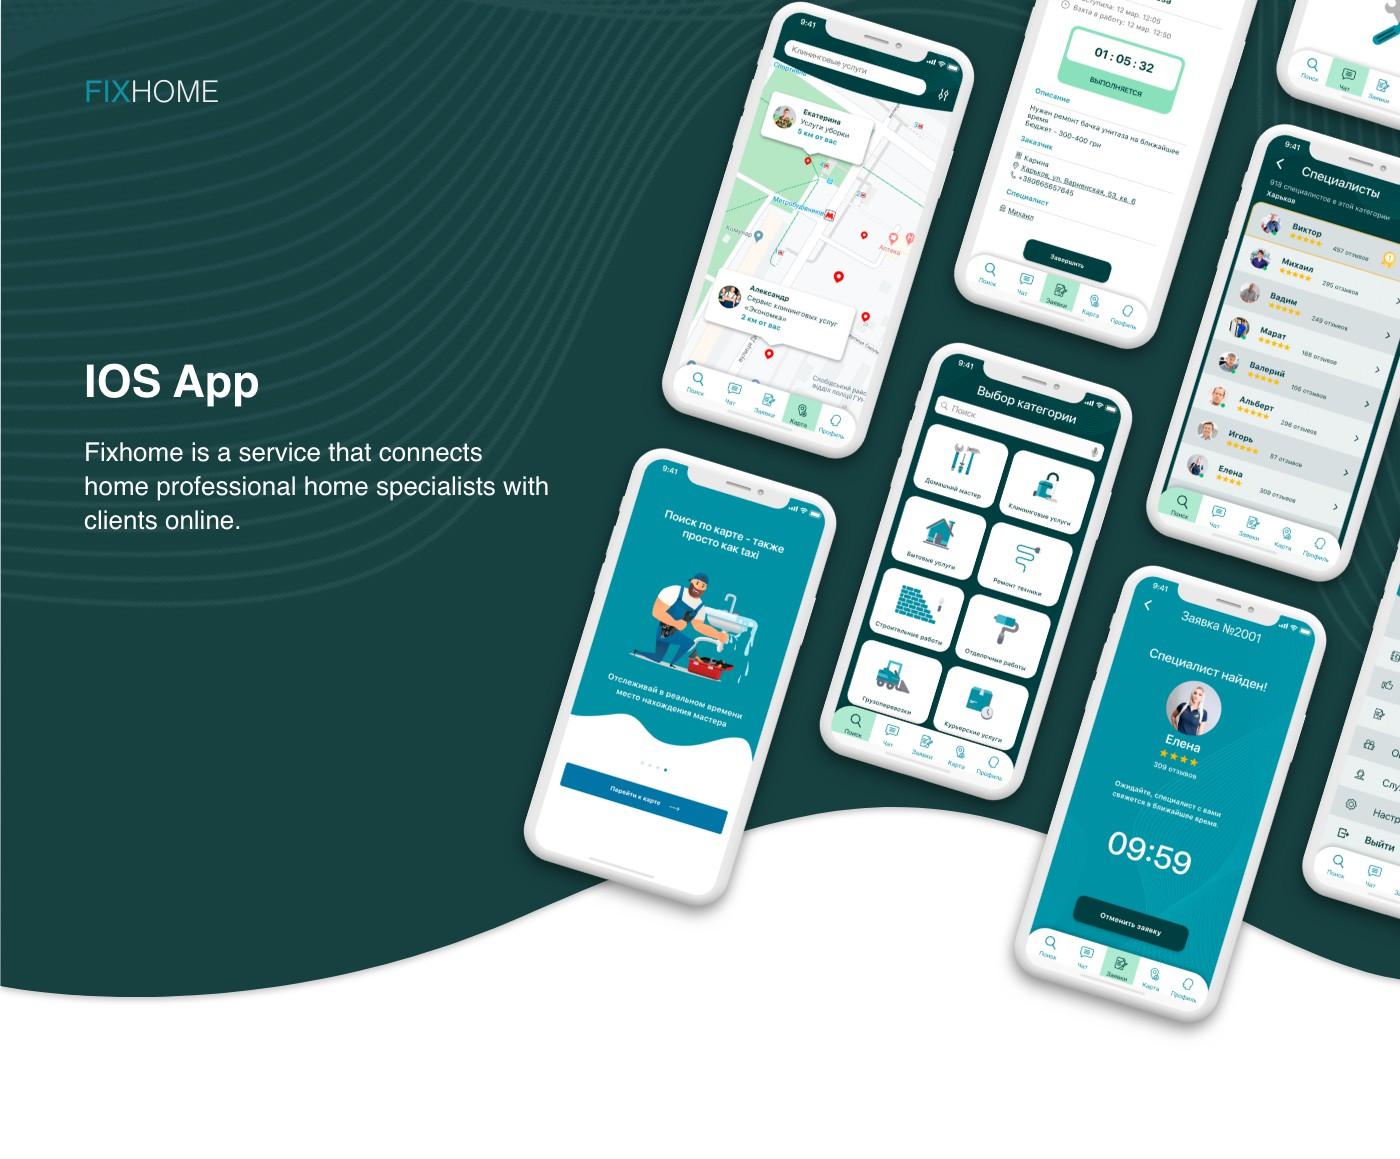 IOS App Fixhome